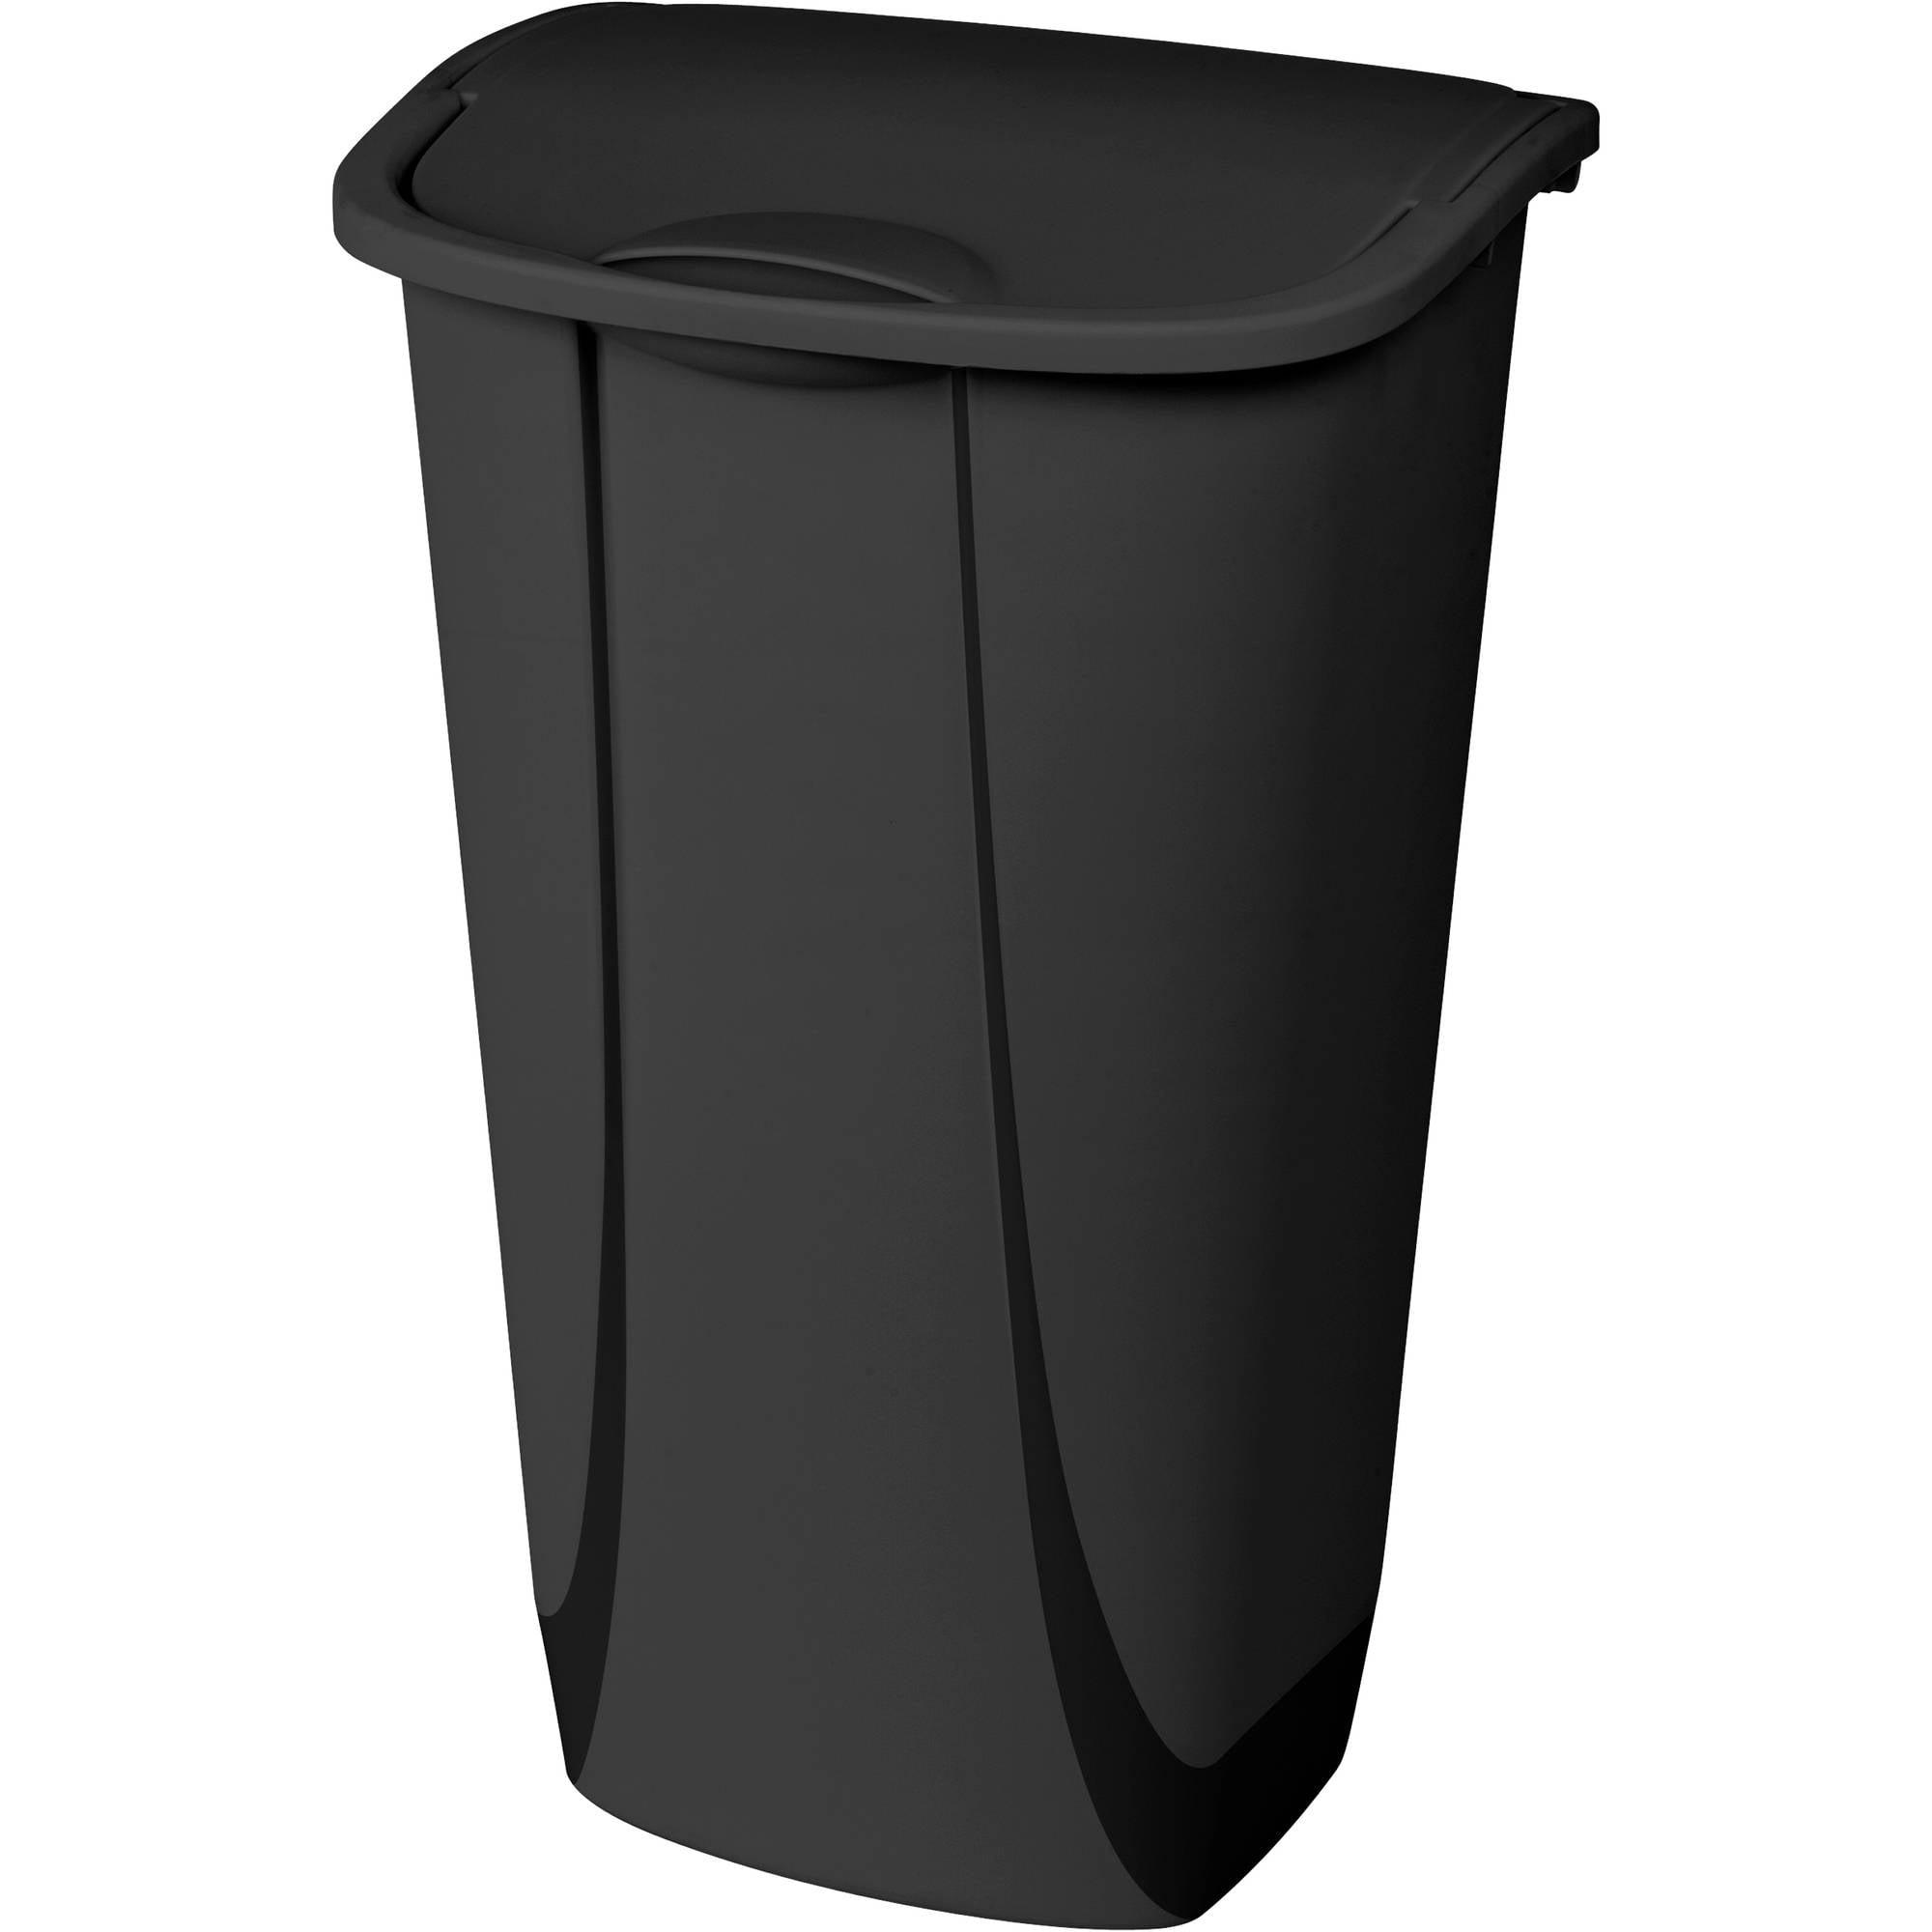 Mainstays 11 Gallon Swingtop Wastebasket, Black